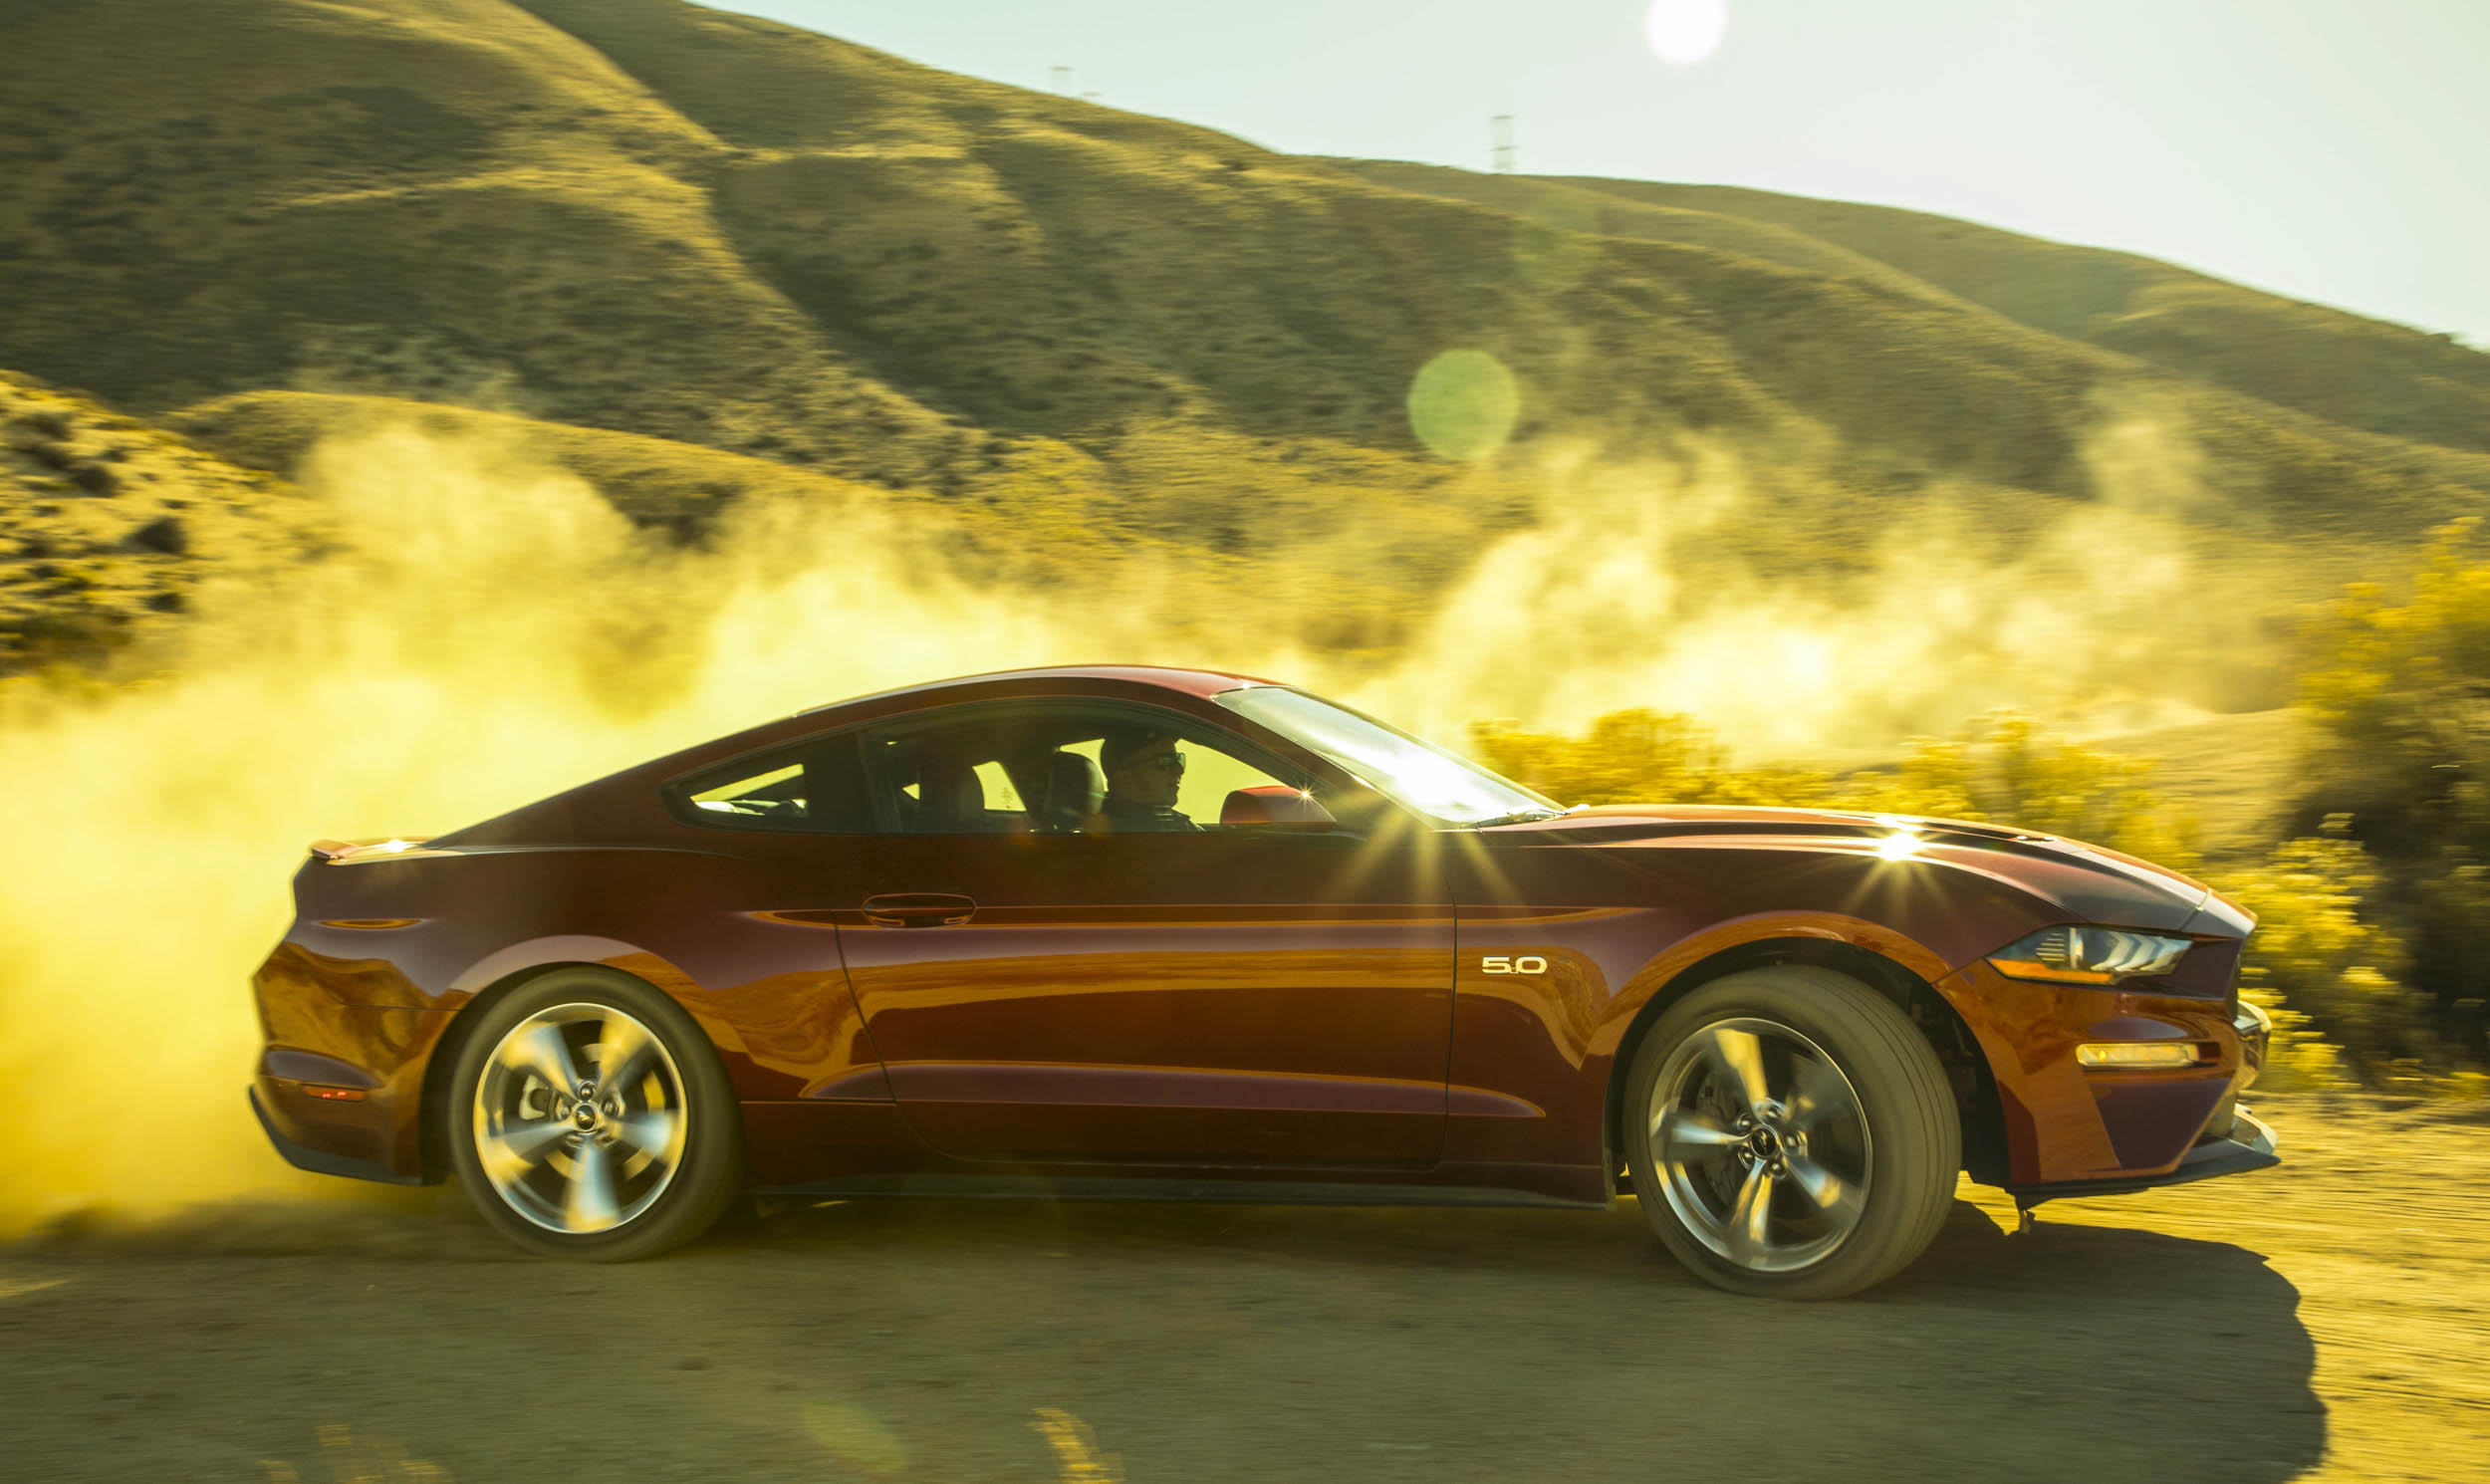 2018 Ford Mustang GT kicking up dirt